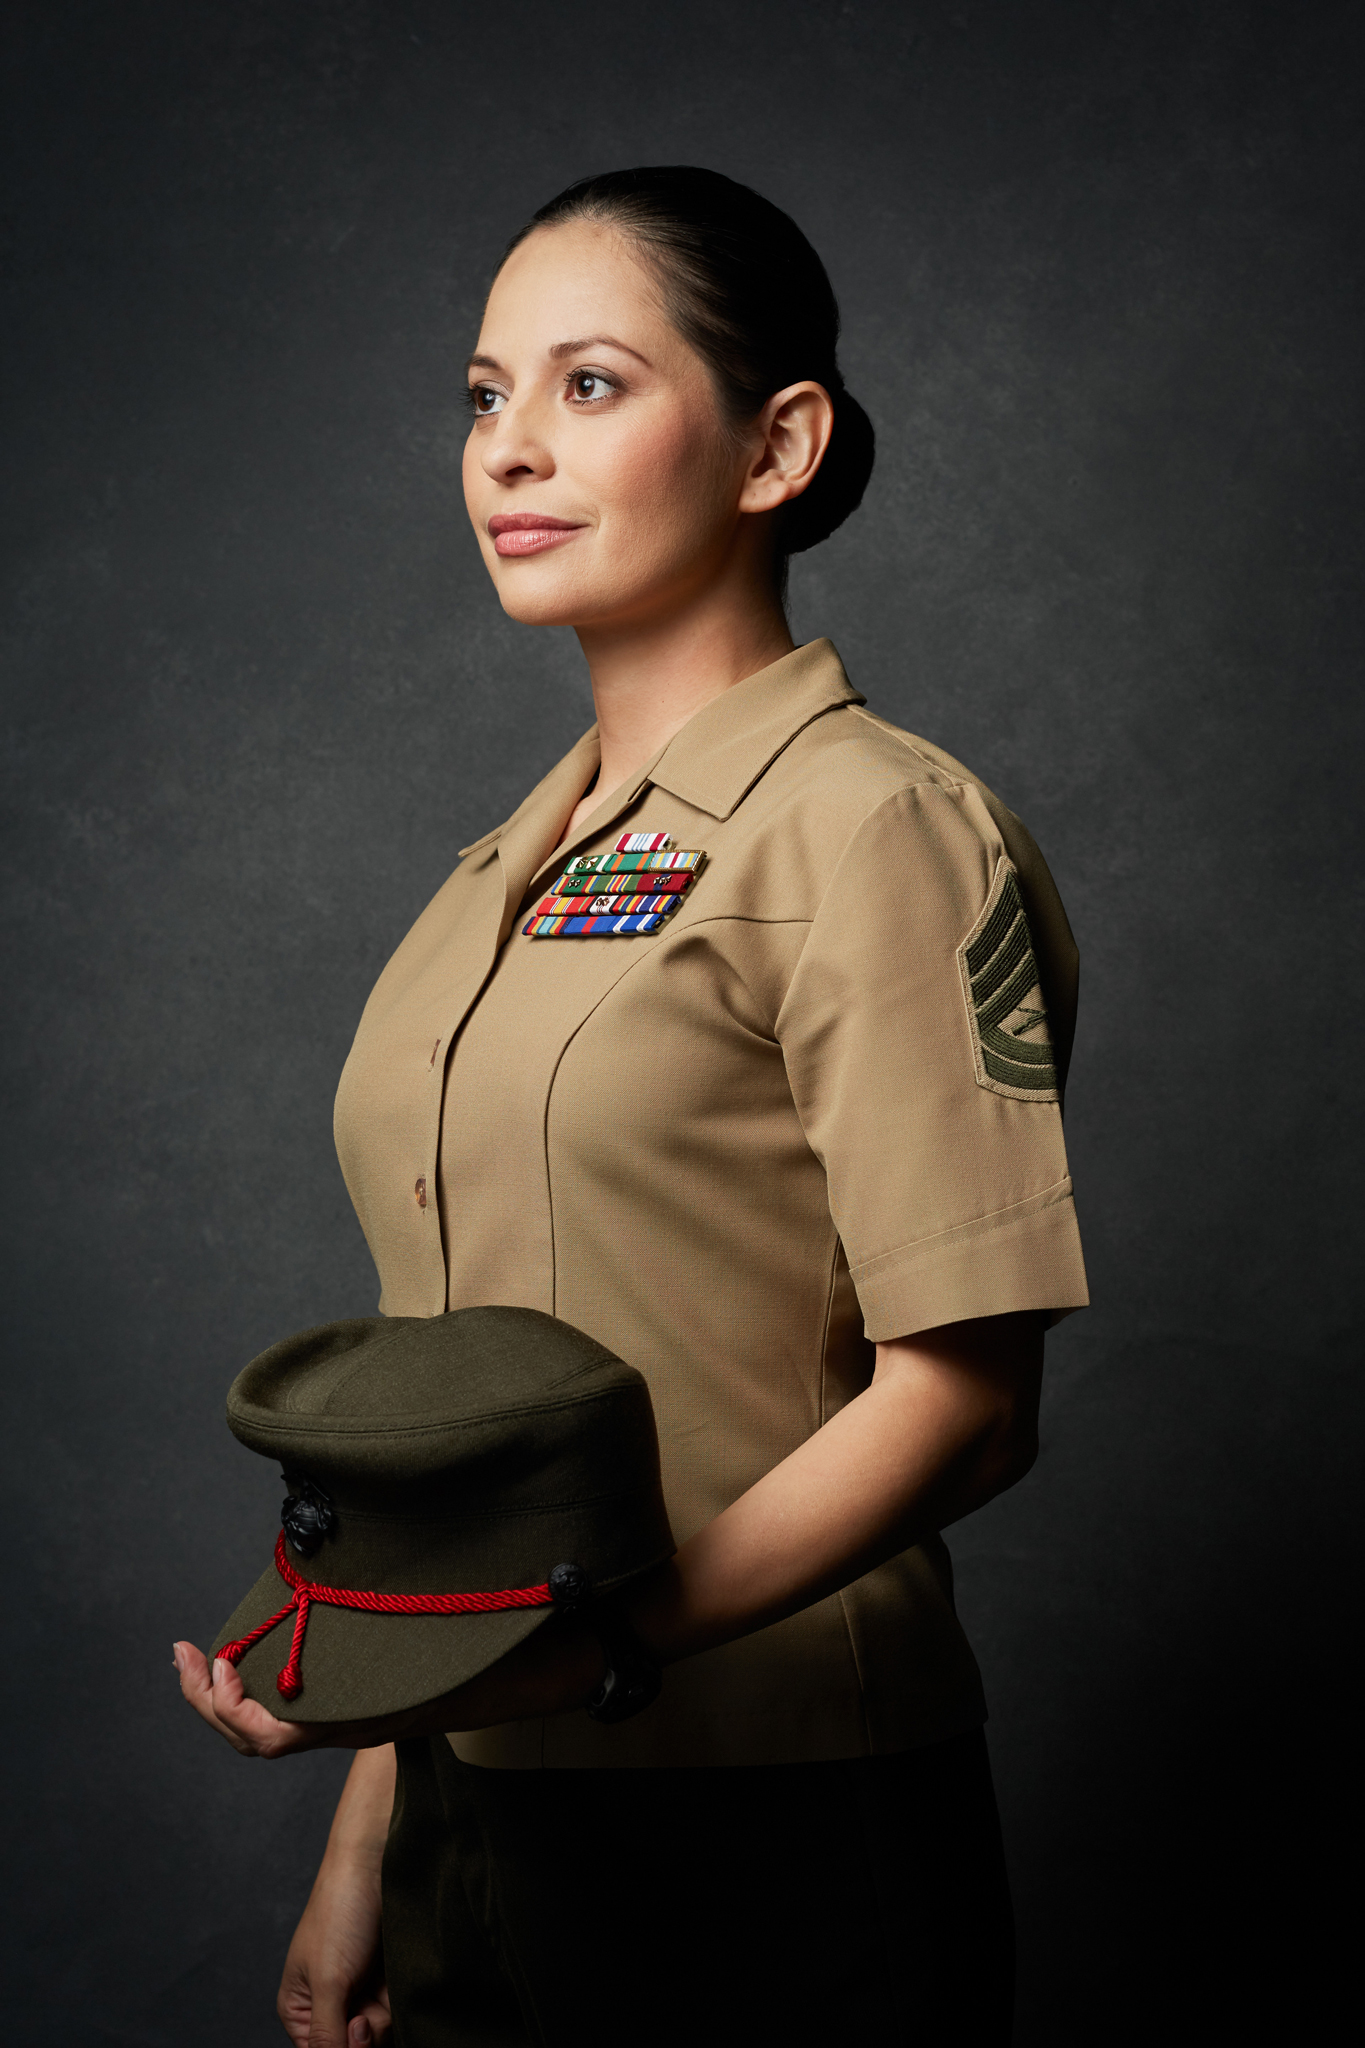 Jenn-McIntyre-Portraits-Military-Women-Project-Marines.jpg